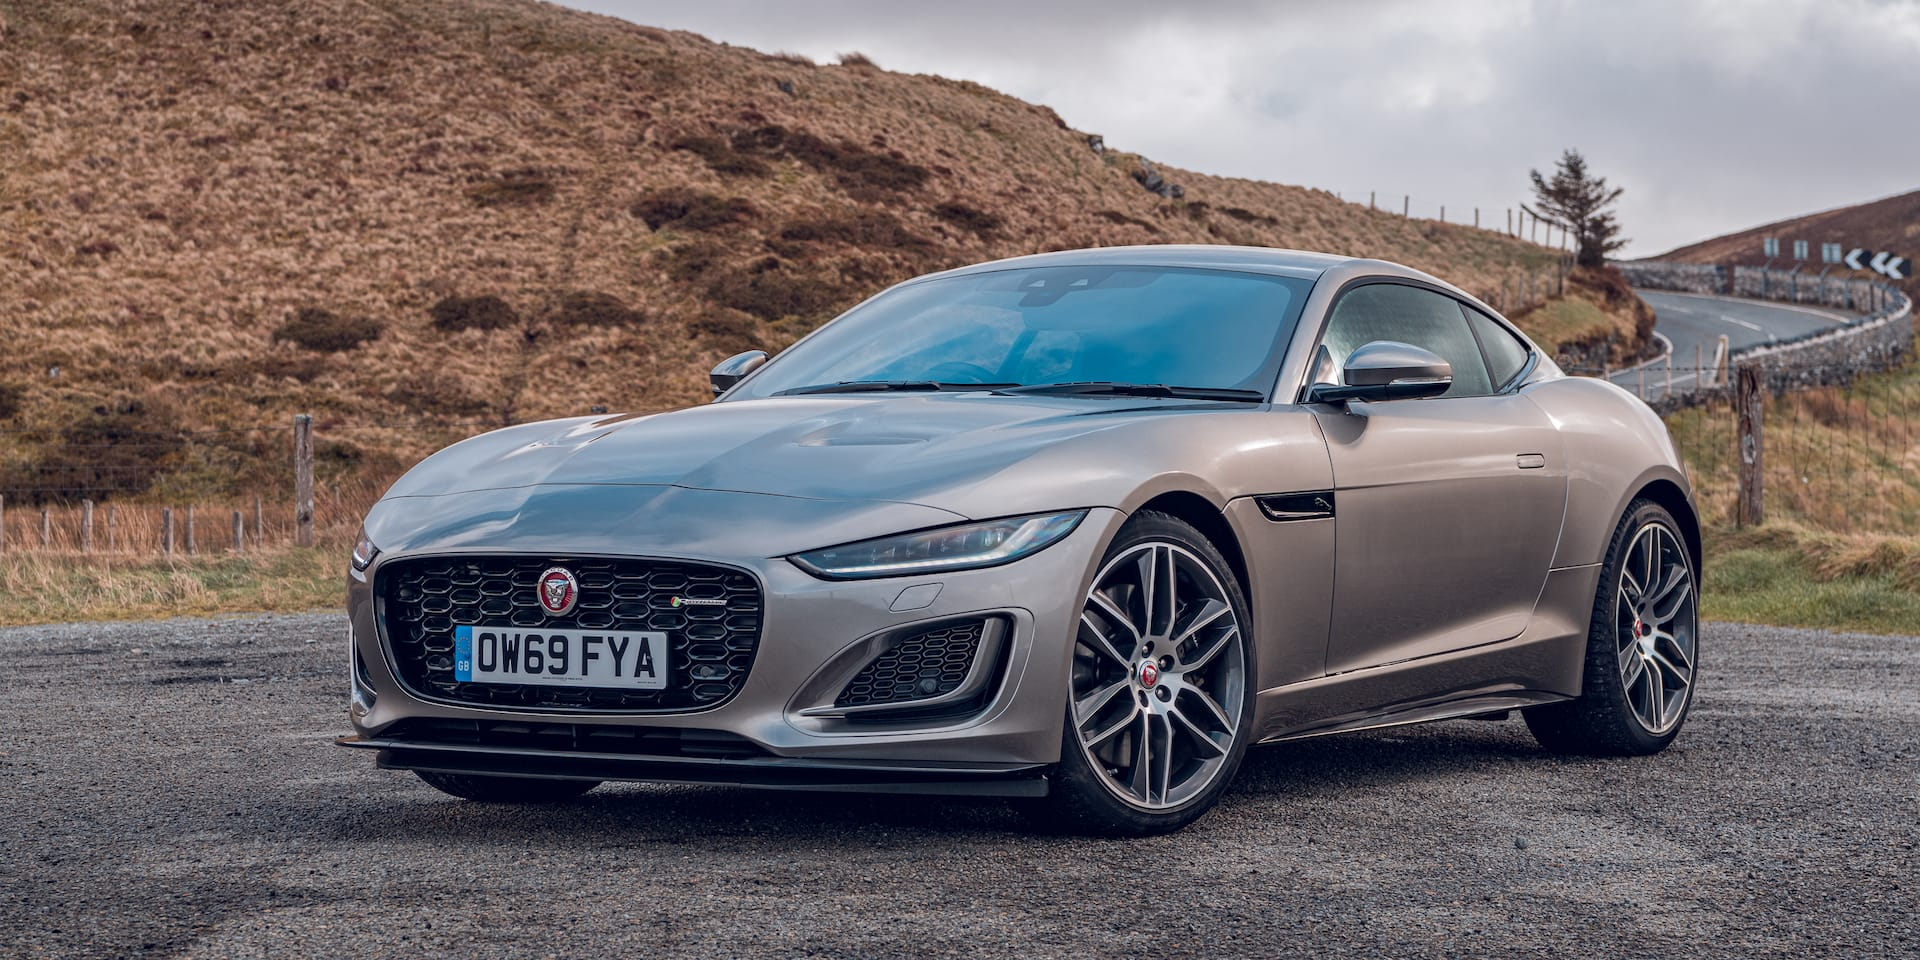 Jaguar F-Type coupe (2020 onwards) – Expert Rating